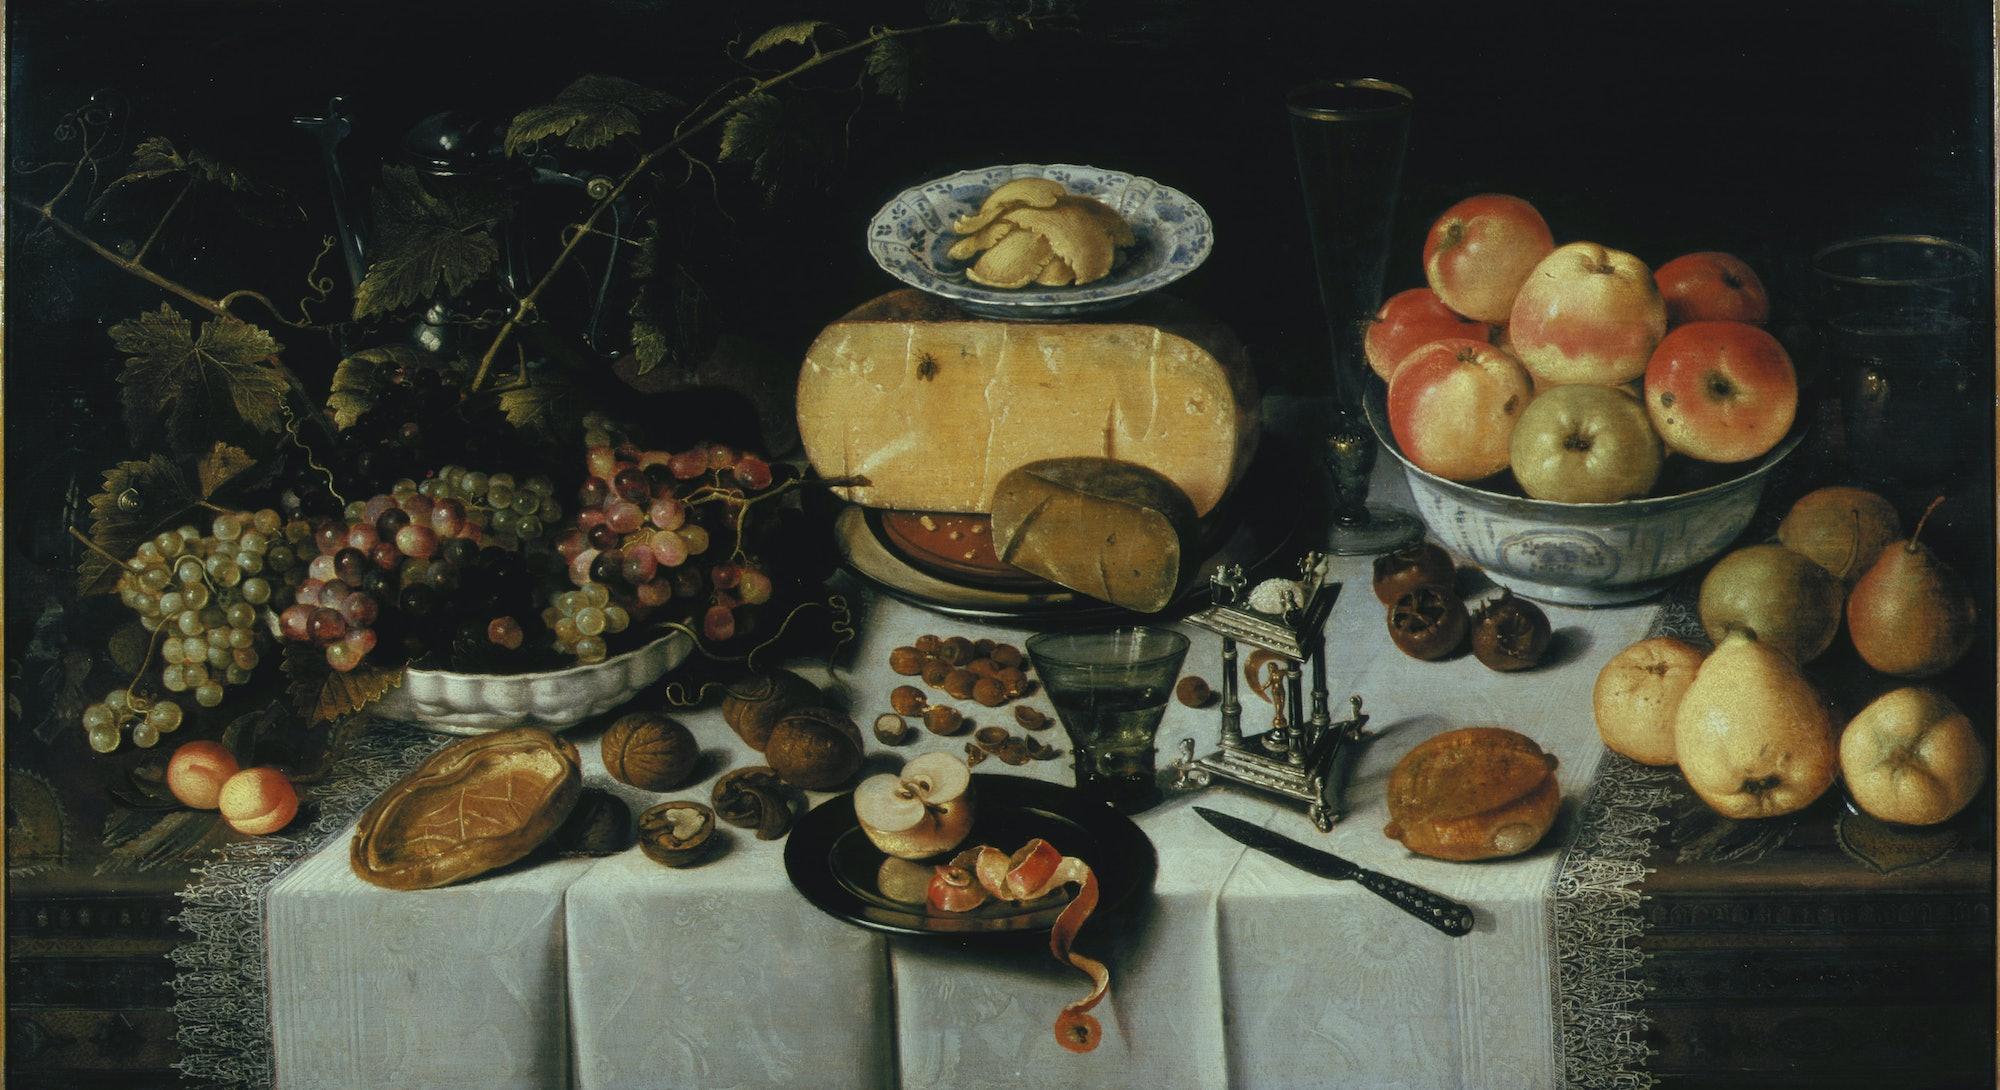 Hulton Fine Art Collection